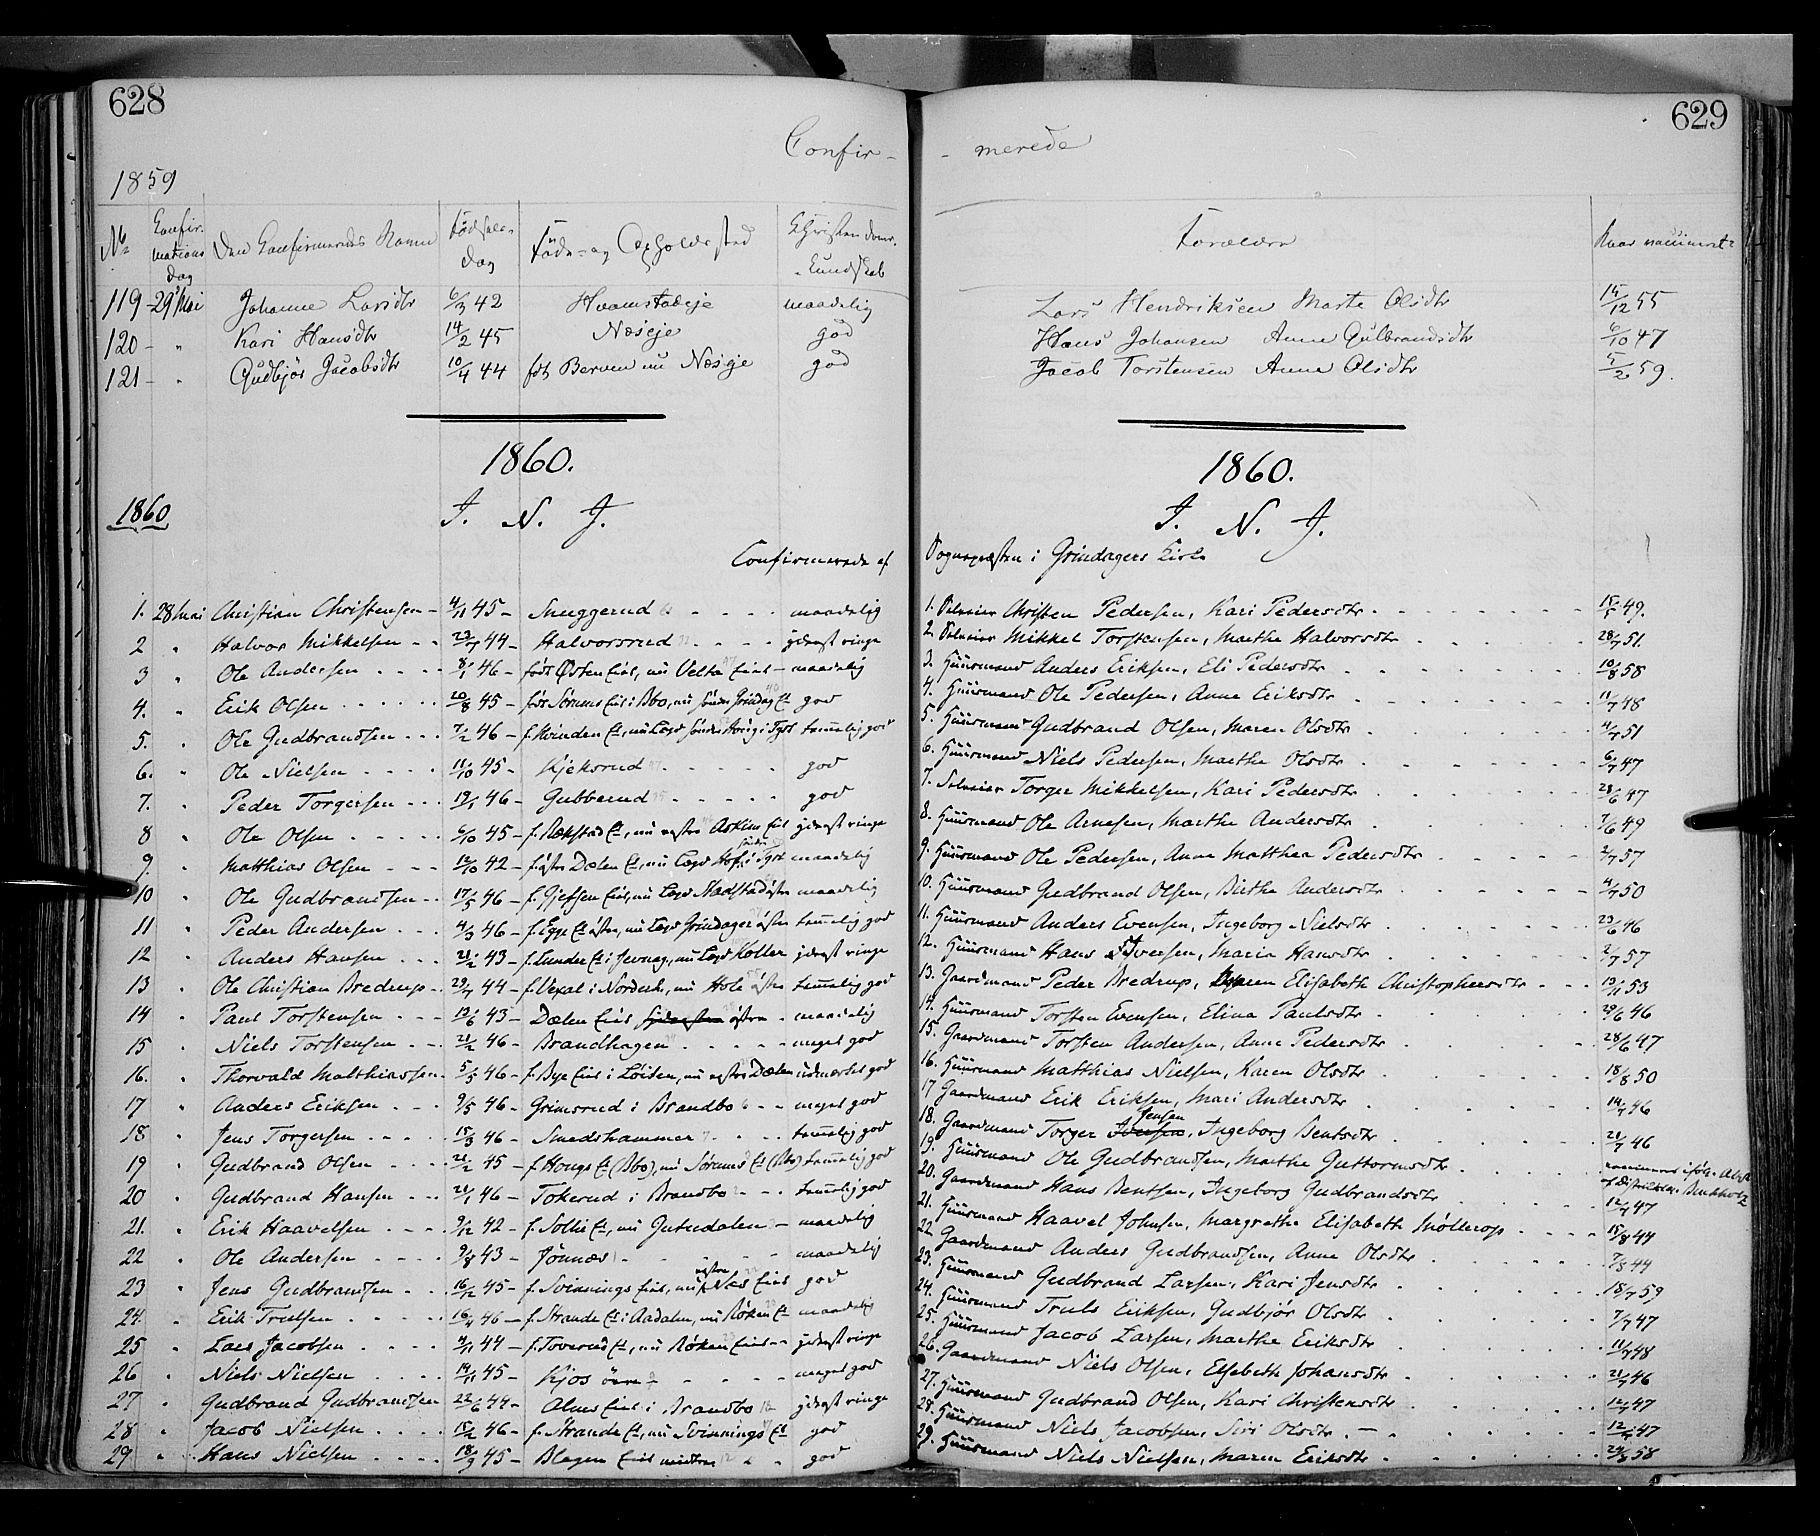 SAH, Gran prestekontor, Ministerialbok nr. 12, 1856-1874, s. 628-629